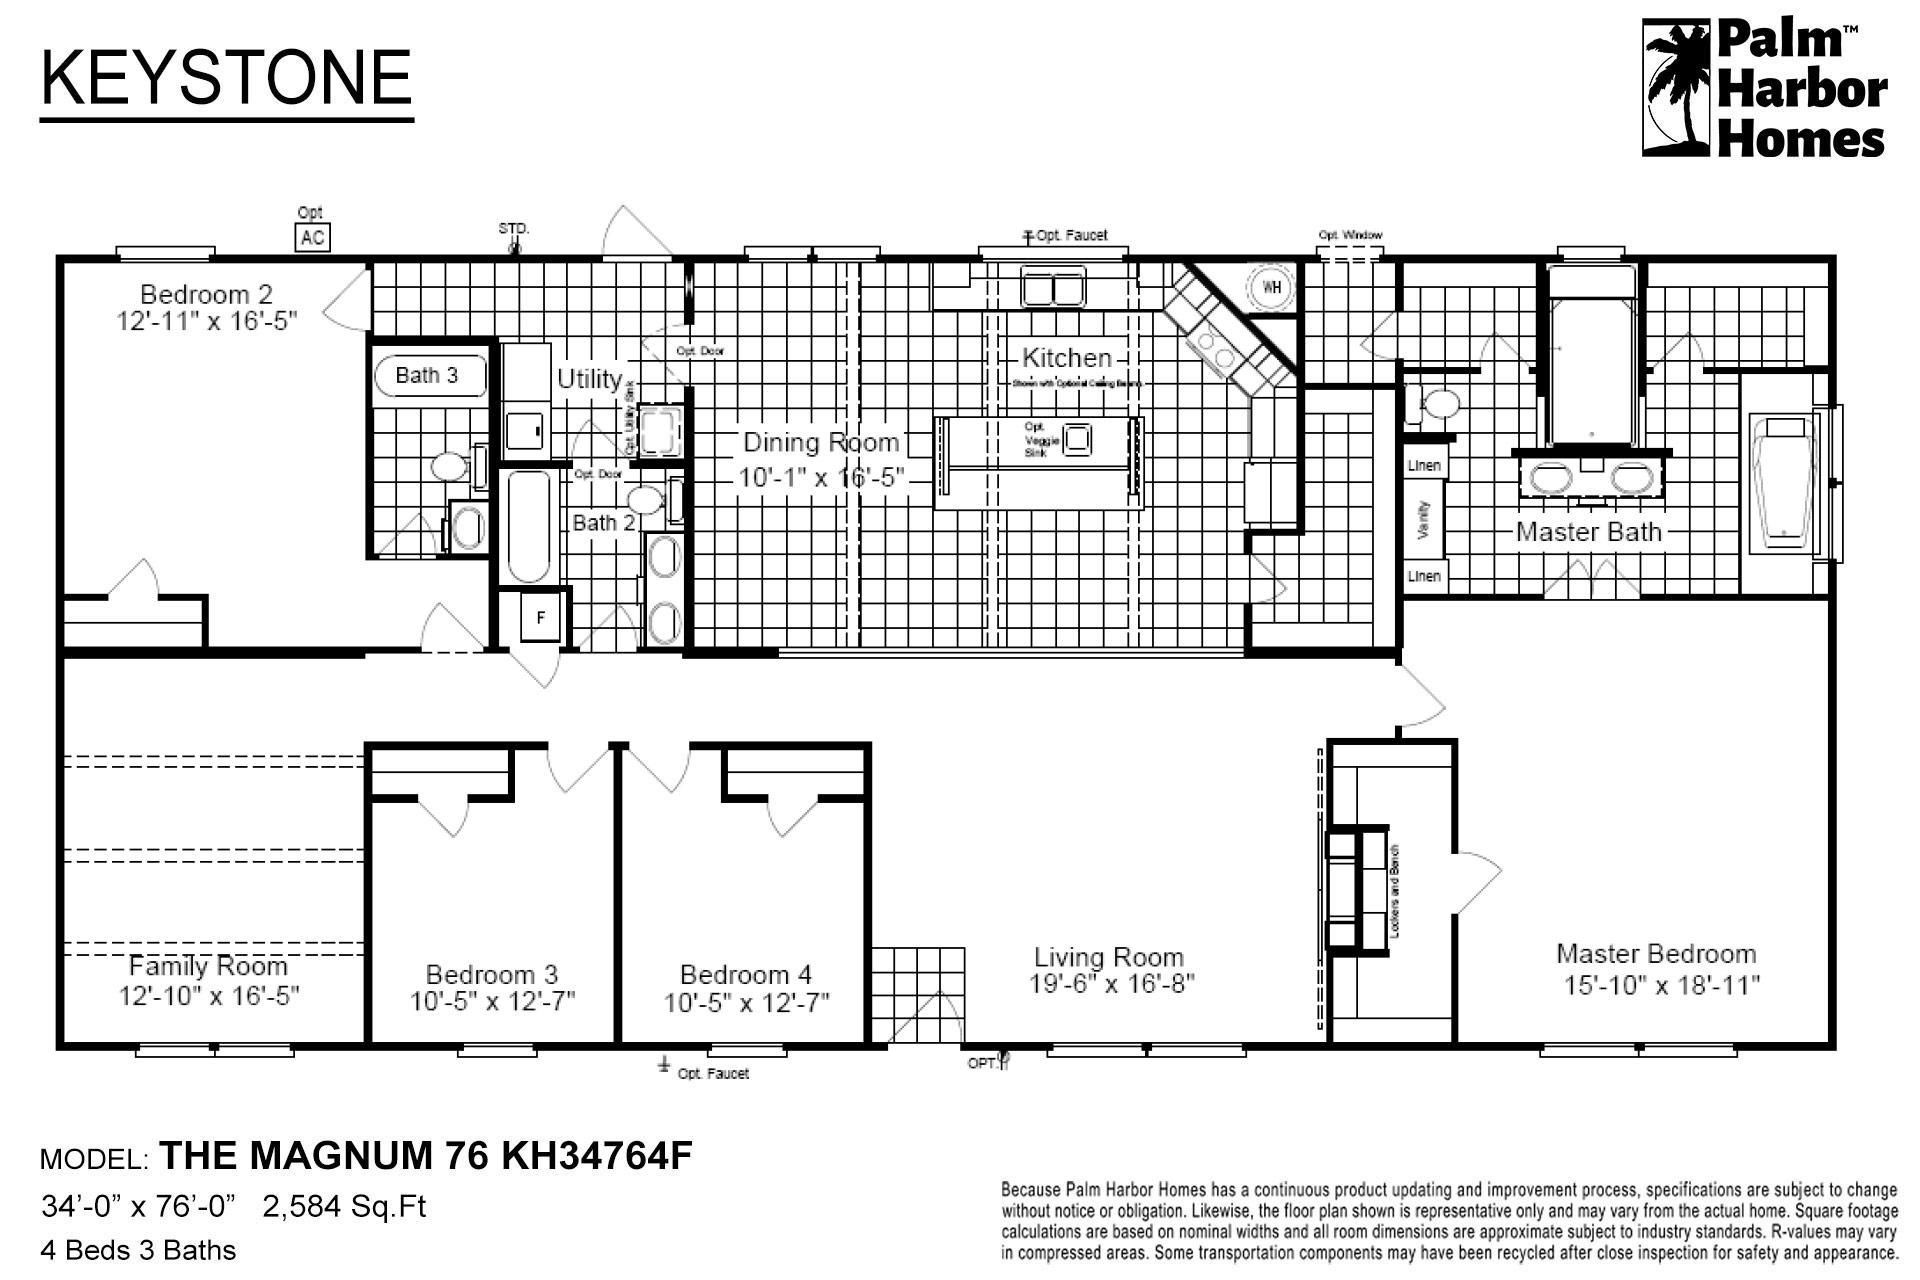 Keystone - The Magnum 76 KH34764F